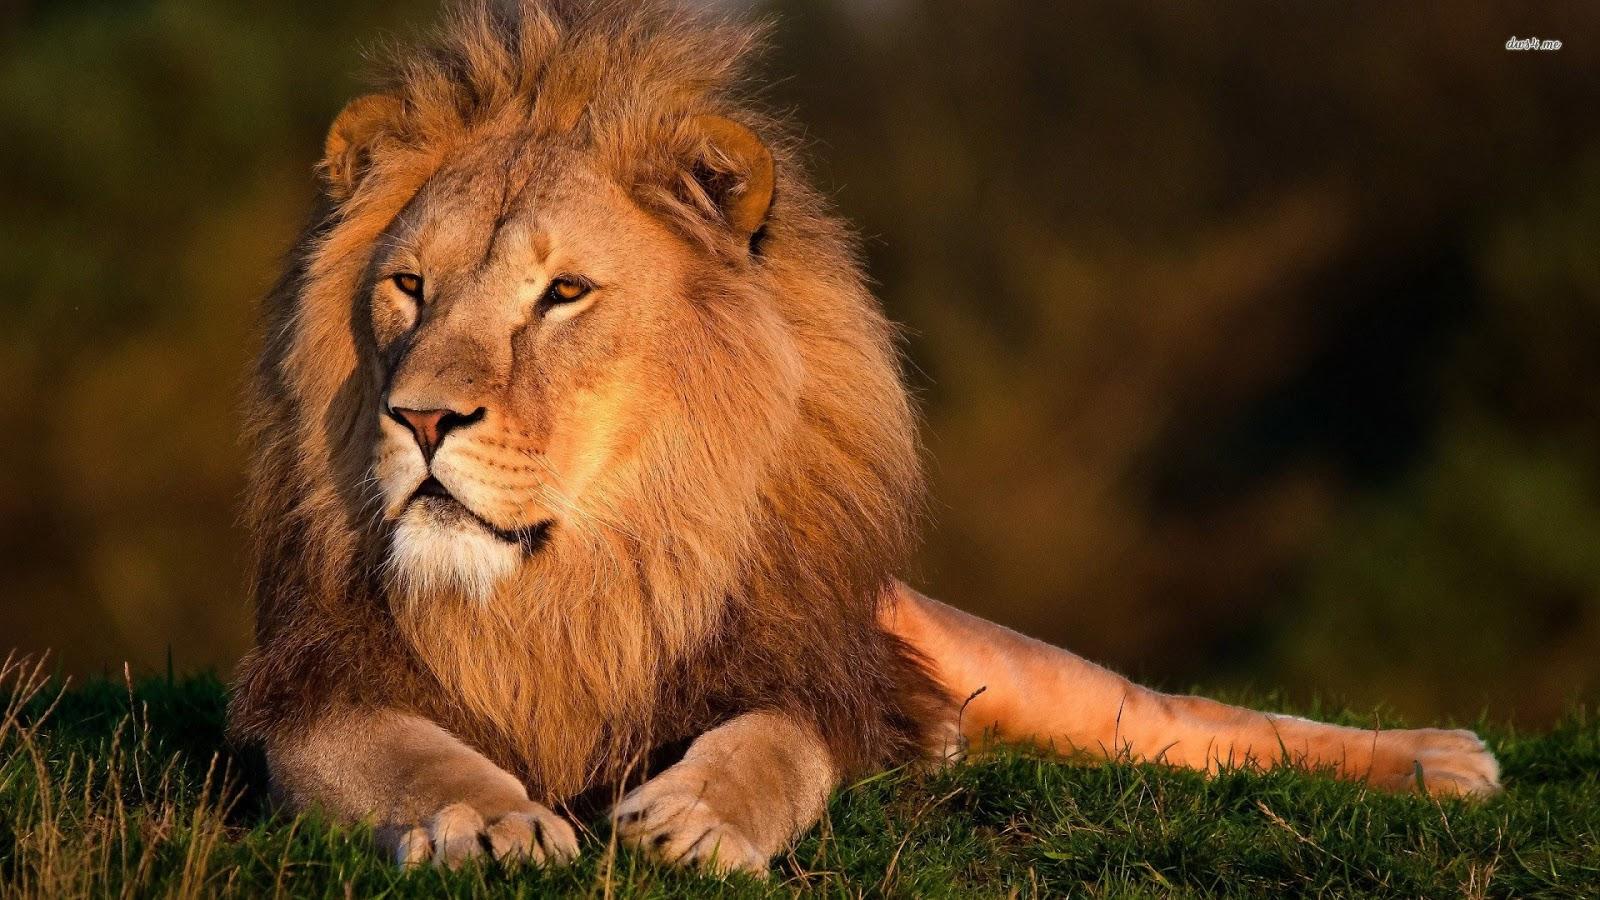 Hd Lion Pictures Lions Wallpapers: Lion Wallpaper HD